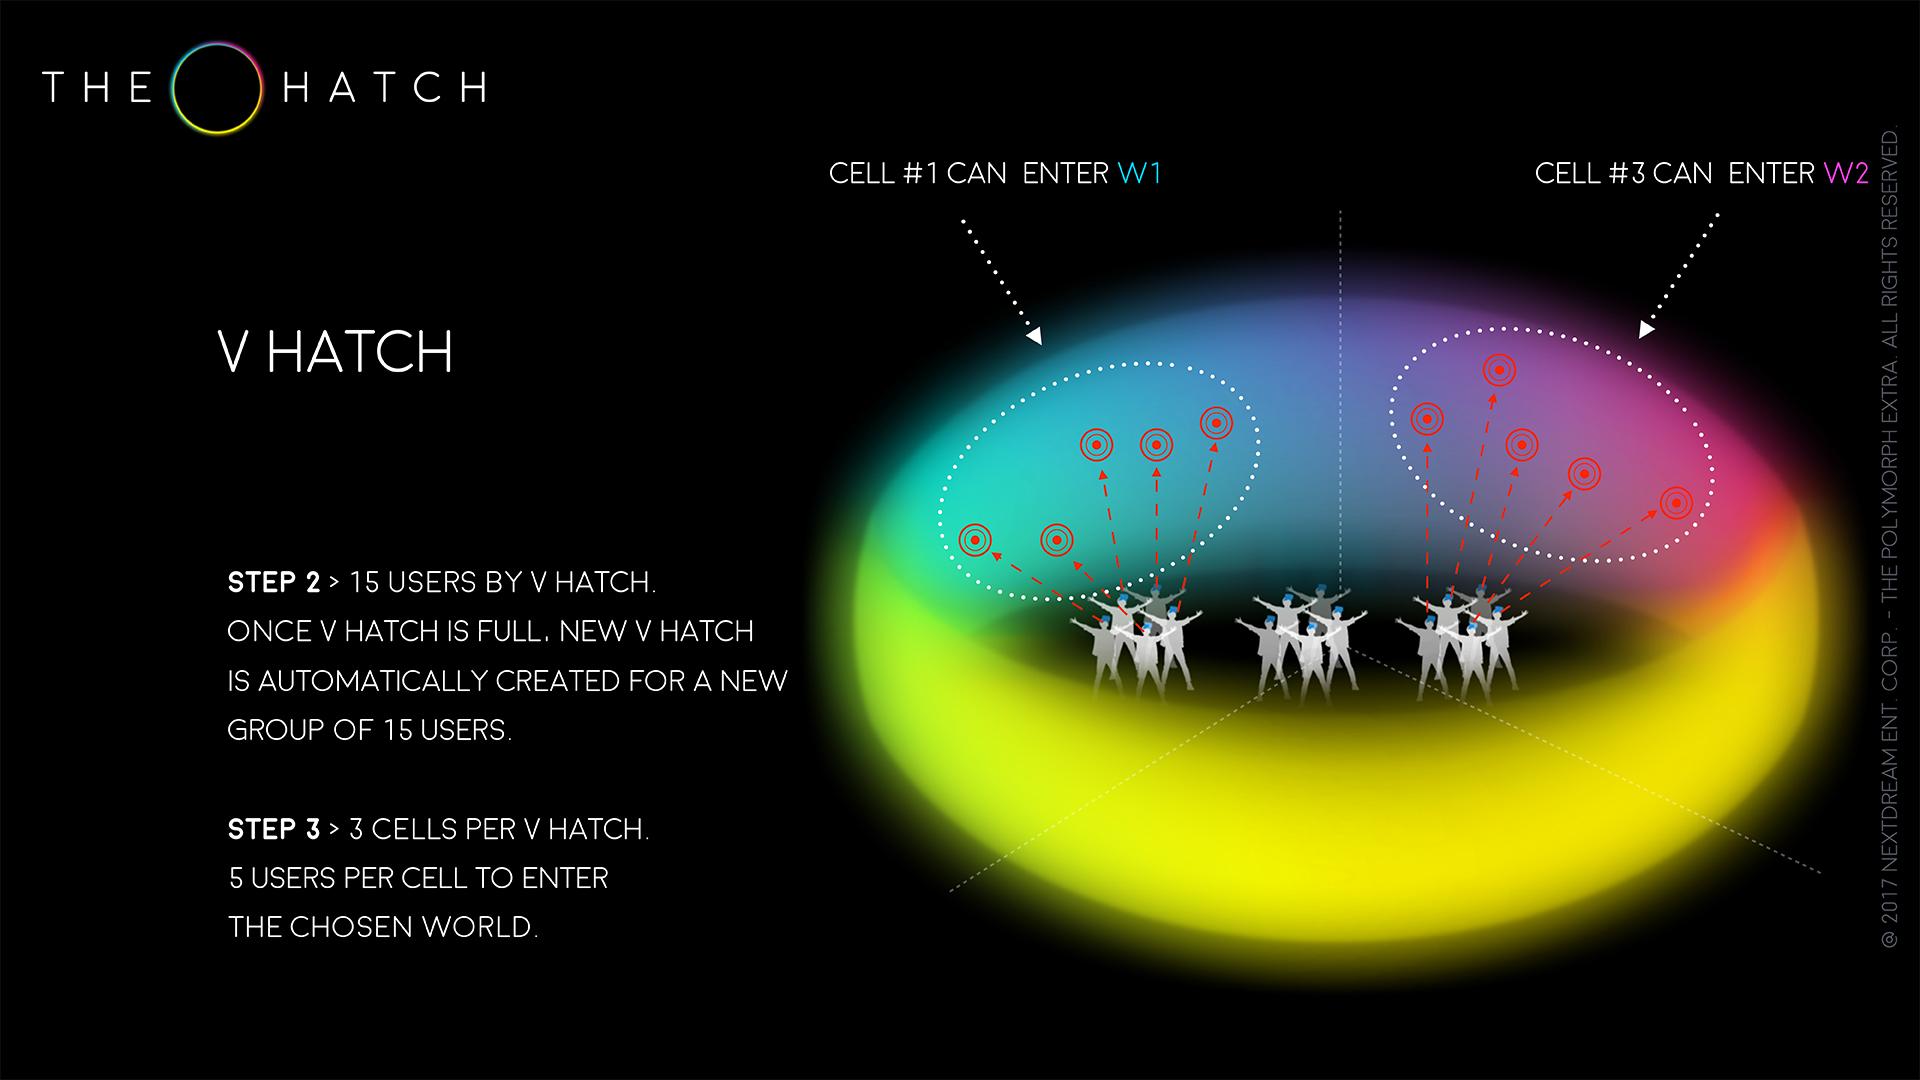 THE-HATCH-©-NEXTDREAM-ENT.-CORP.---THE-POLYMORPH-EXTRA-36.jpg